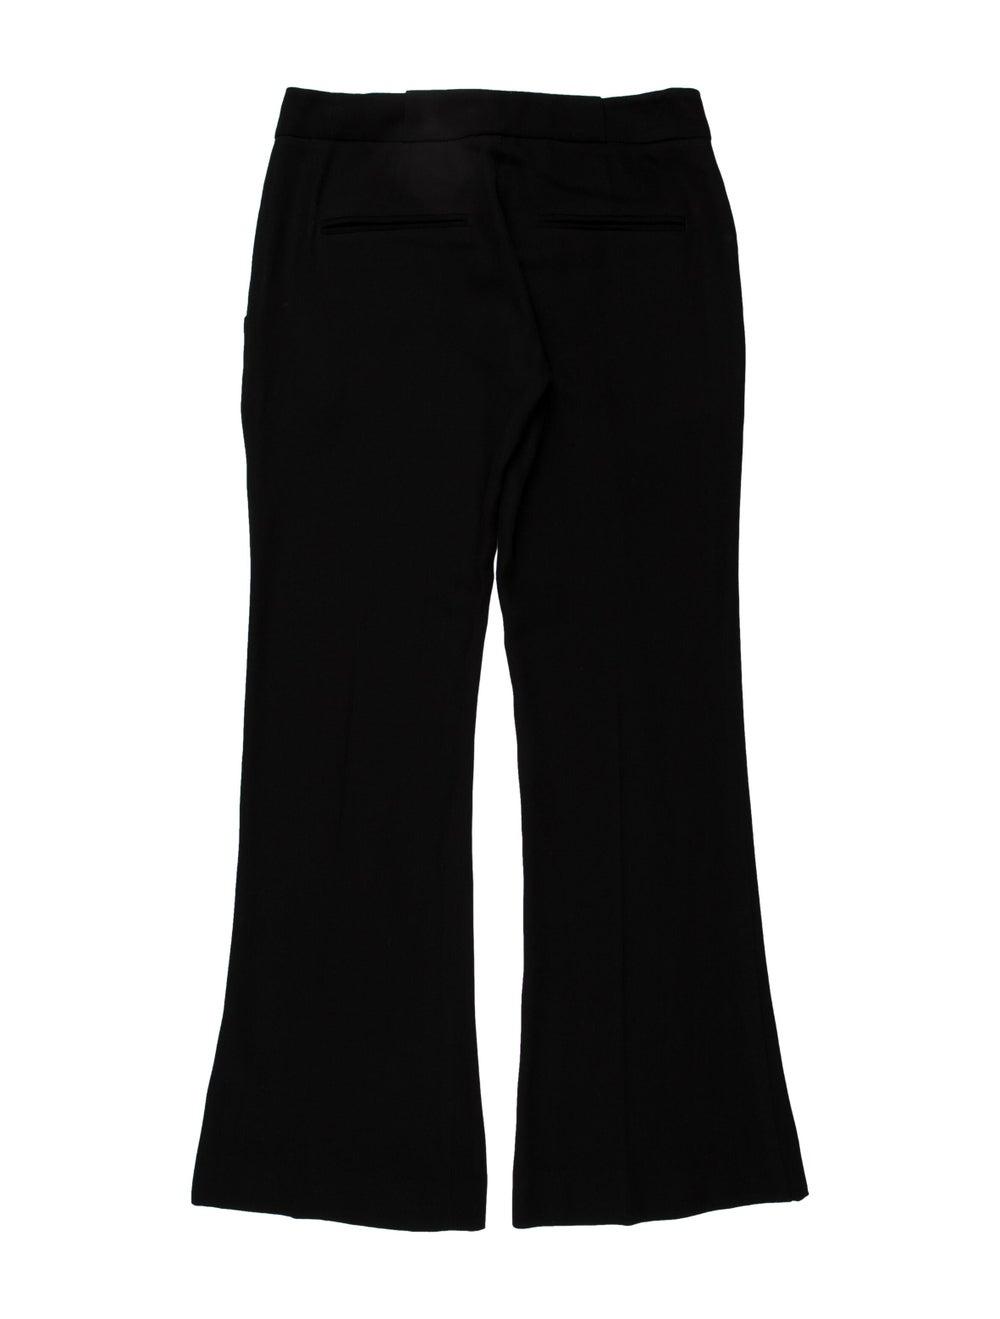 Theory Wide Leg Pants Black - image 2